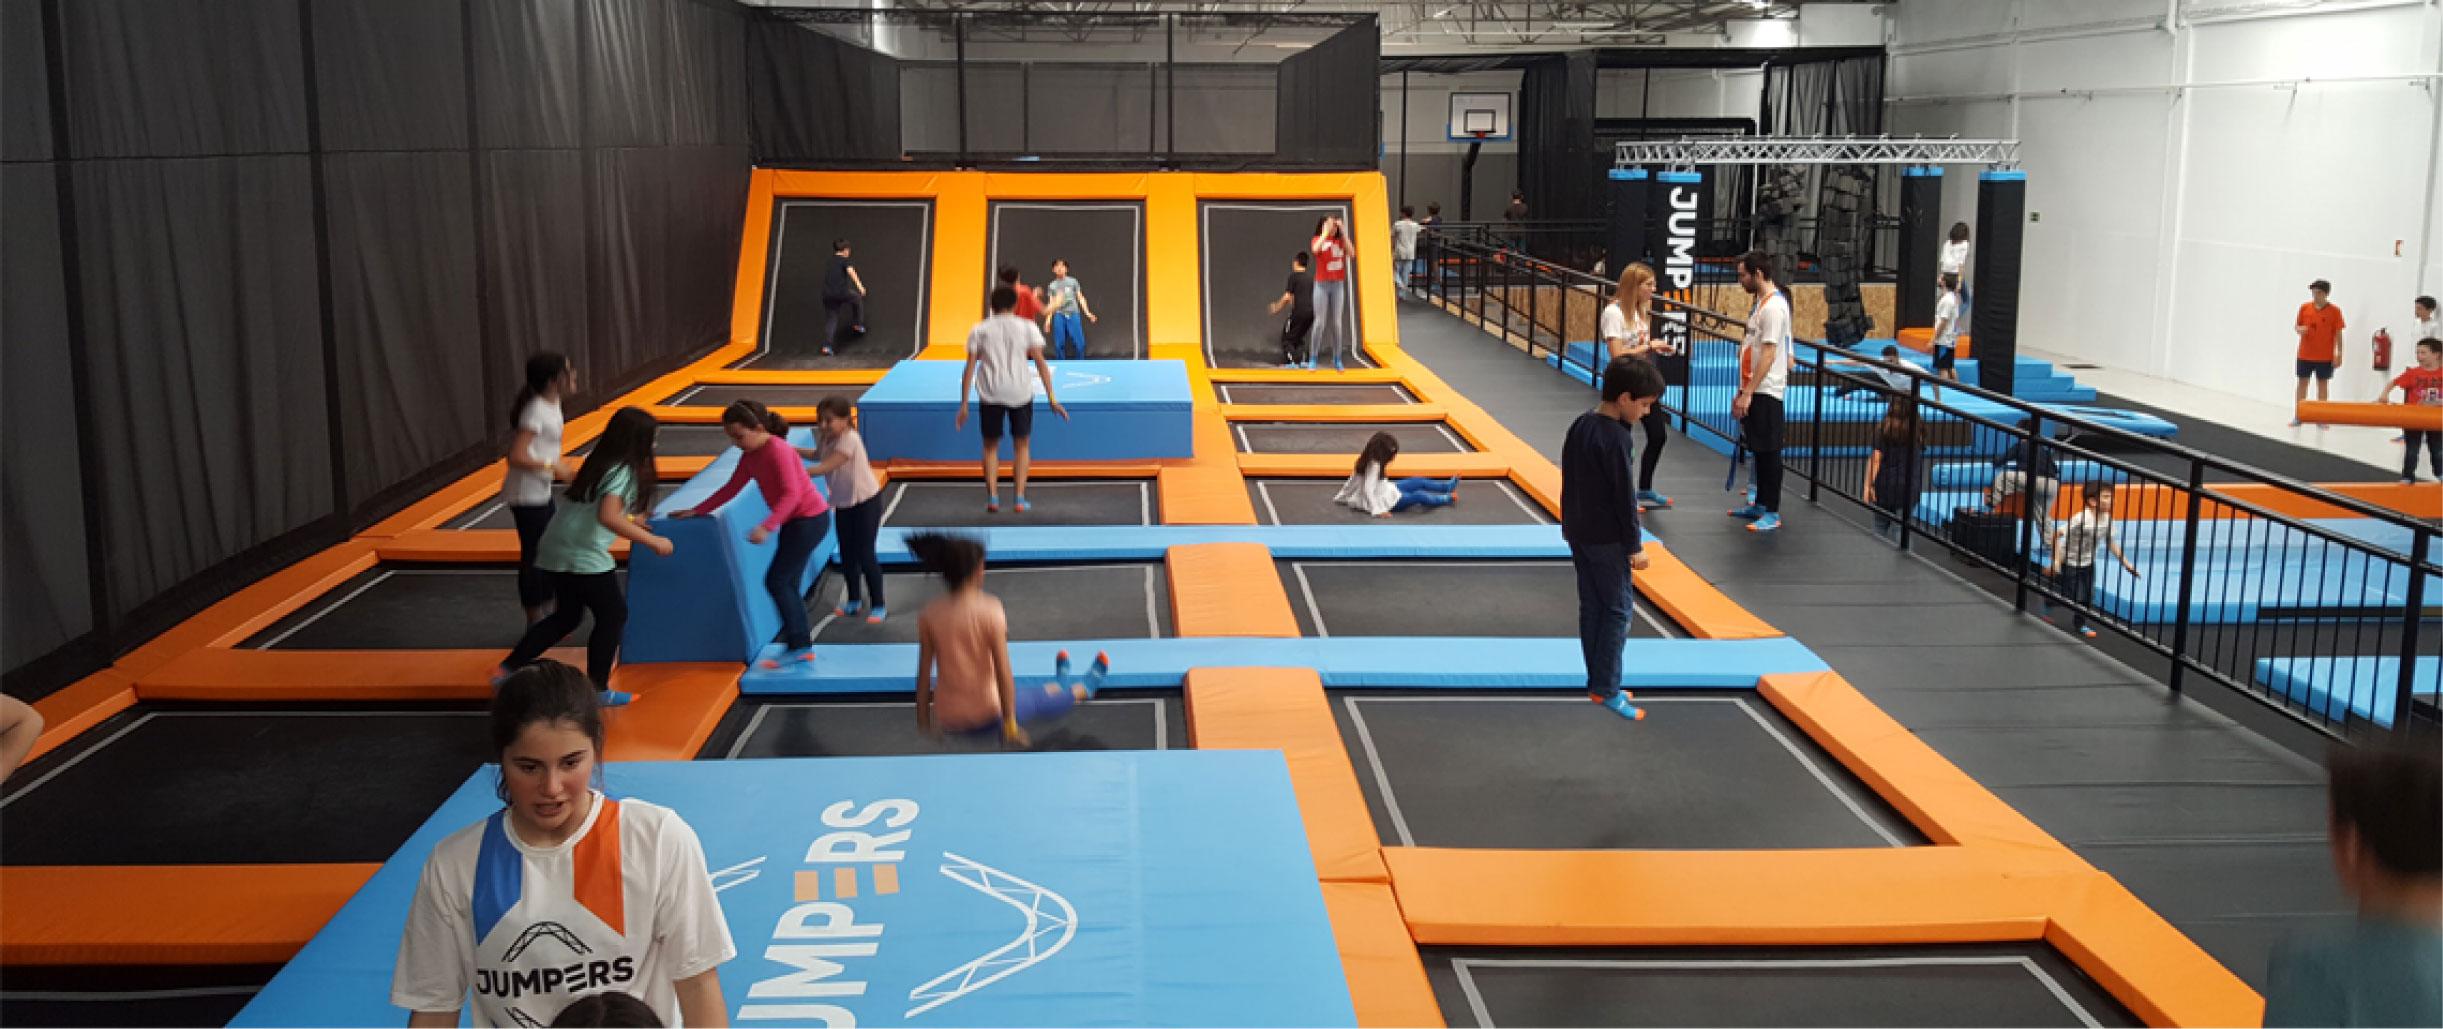 jumpers-porto-aniversarios-trampolins.jpg